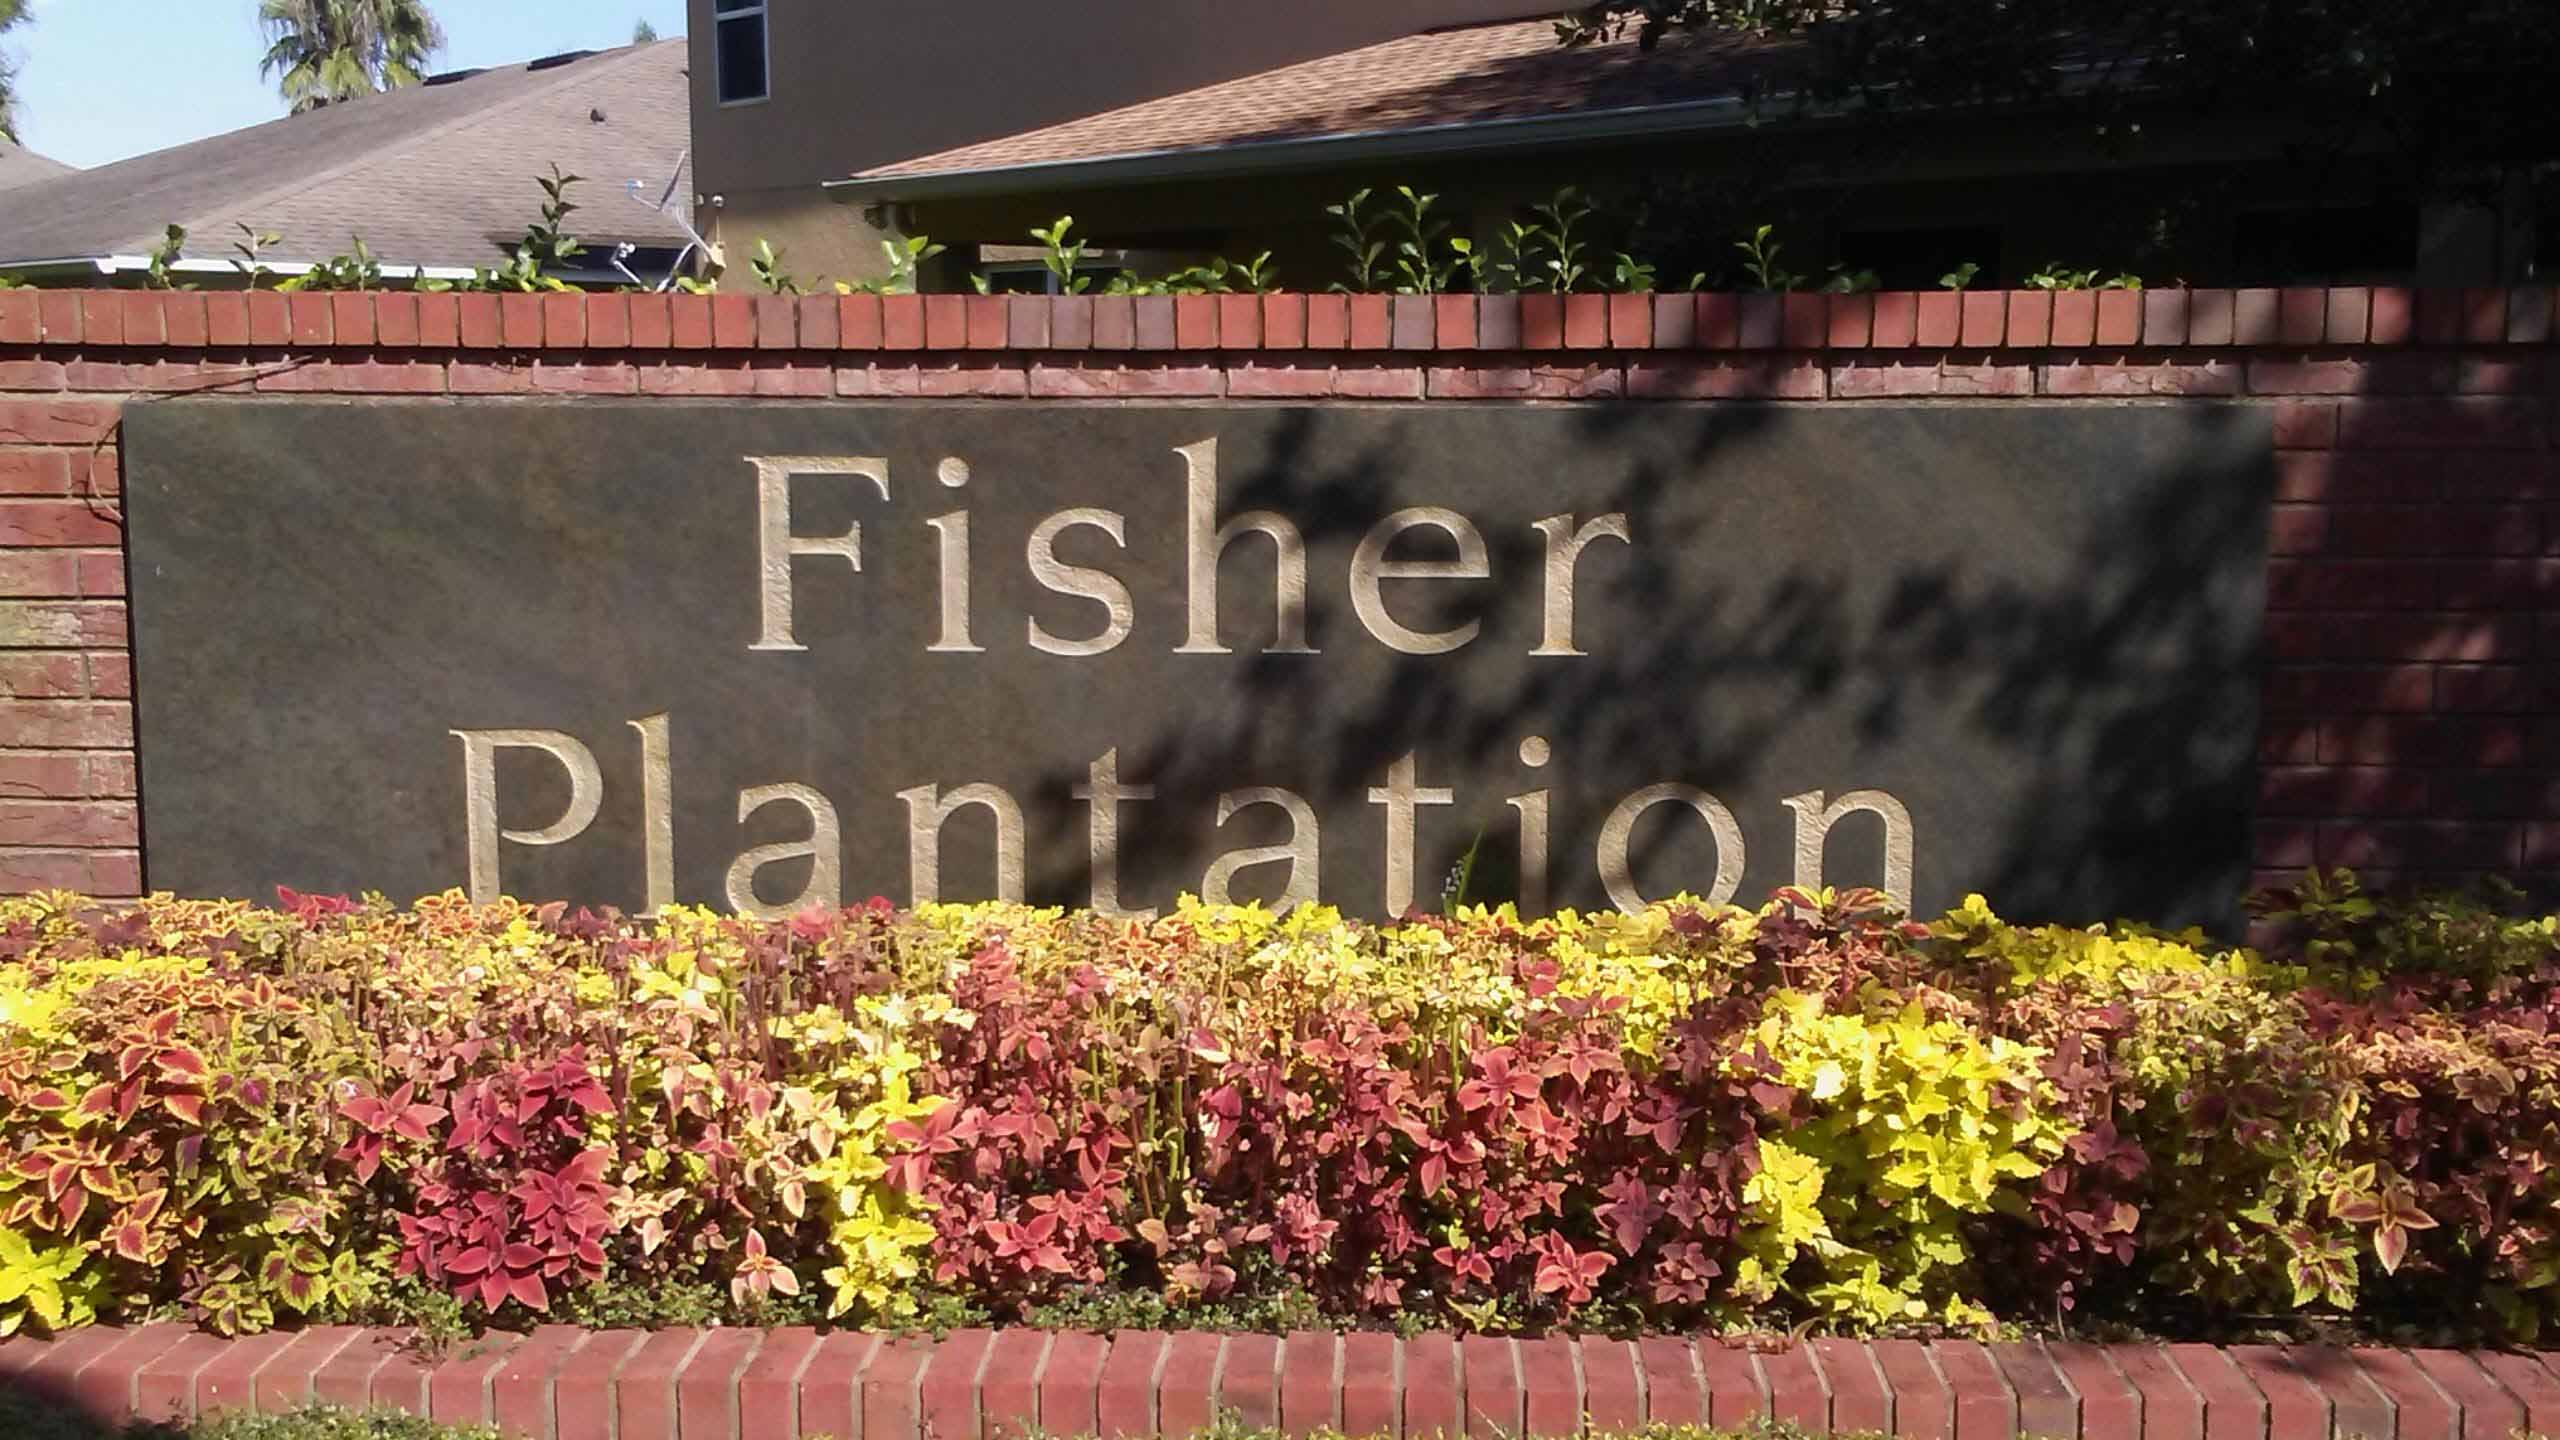 Fisher Plantation, Apopka, Florida 32712